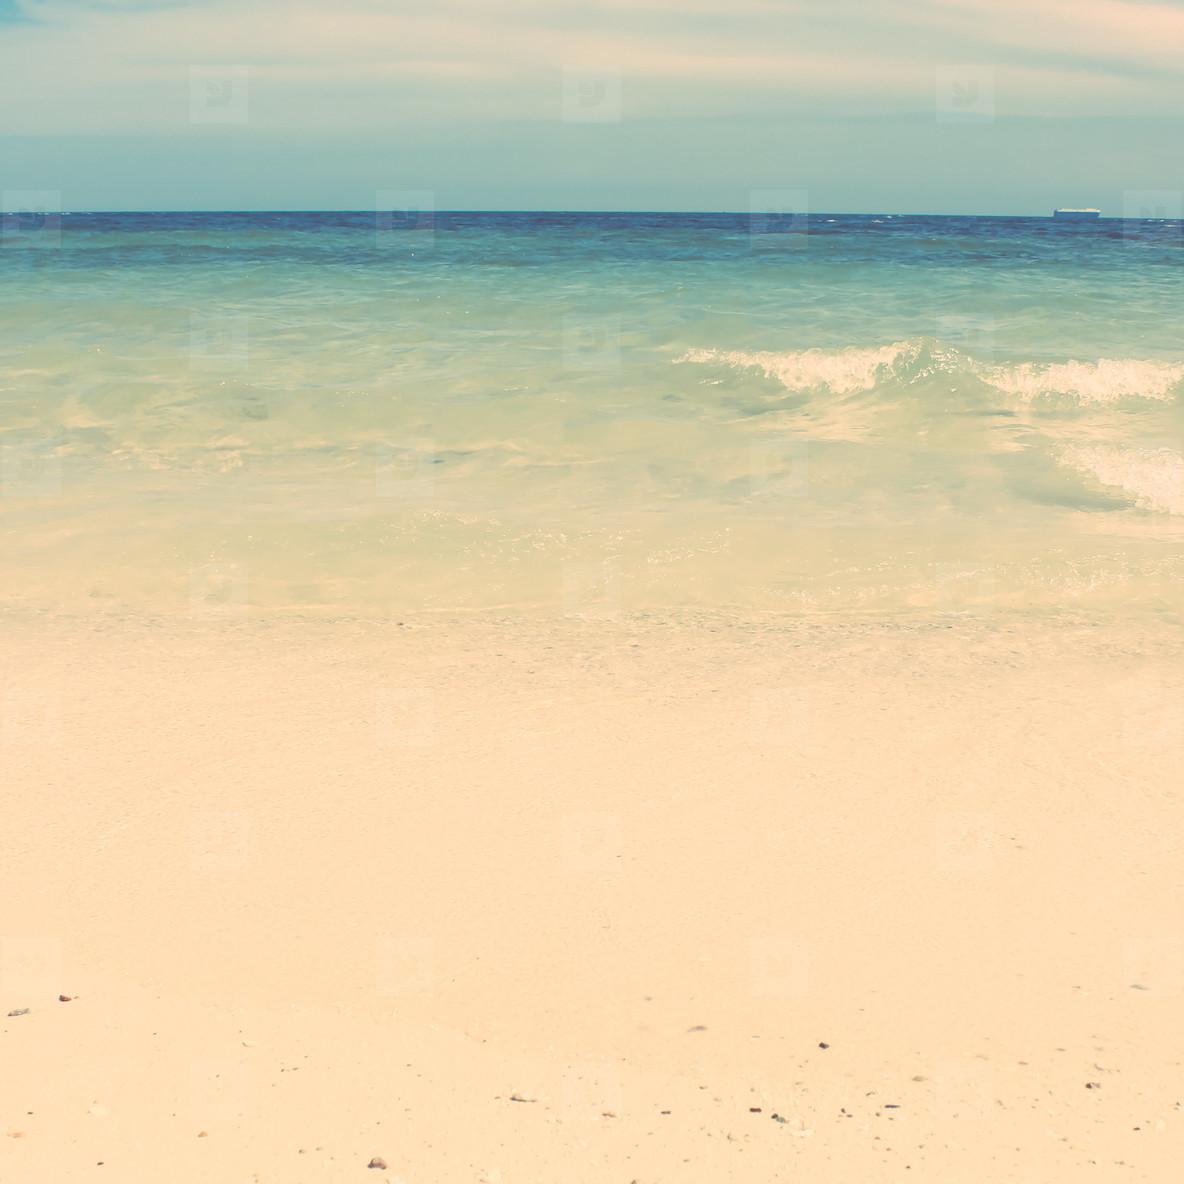 vintage style of  summer beach